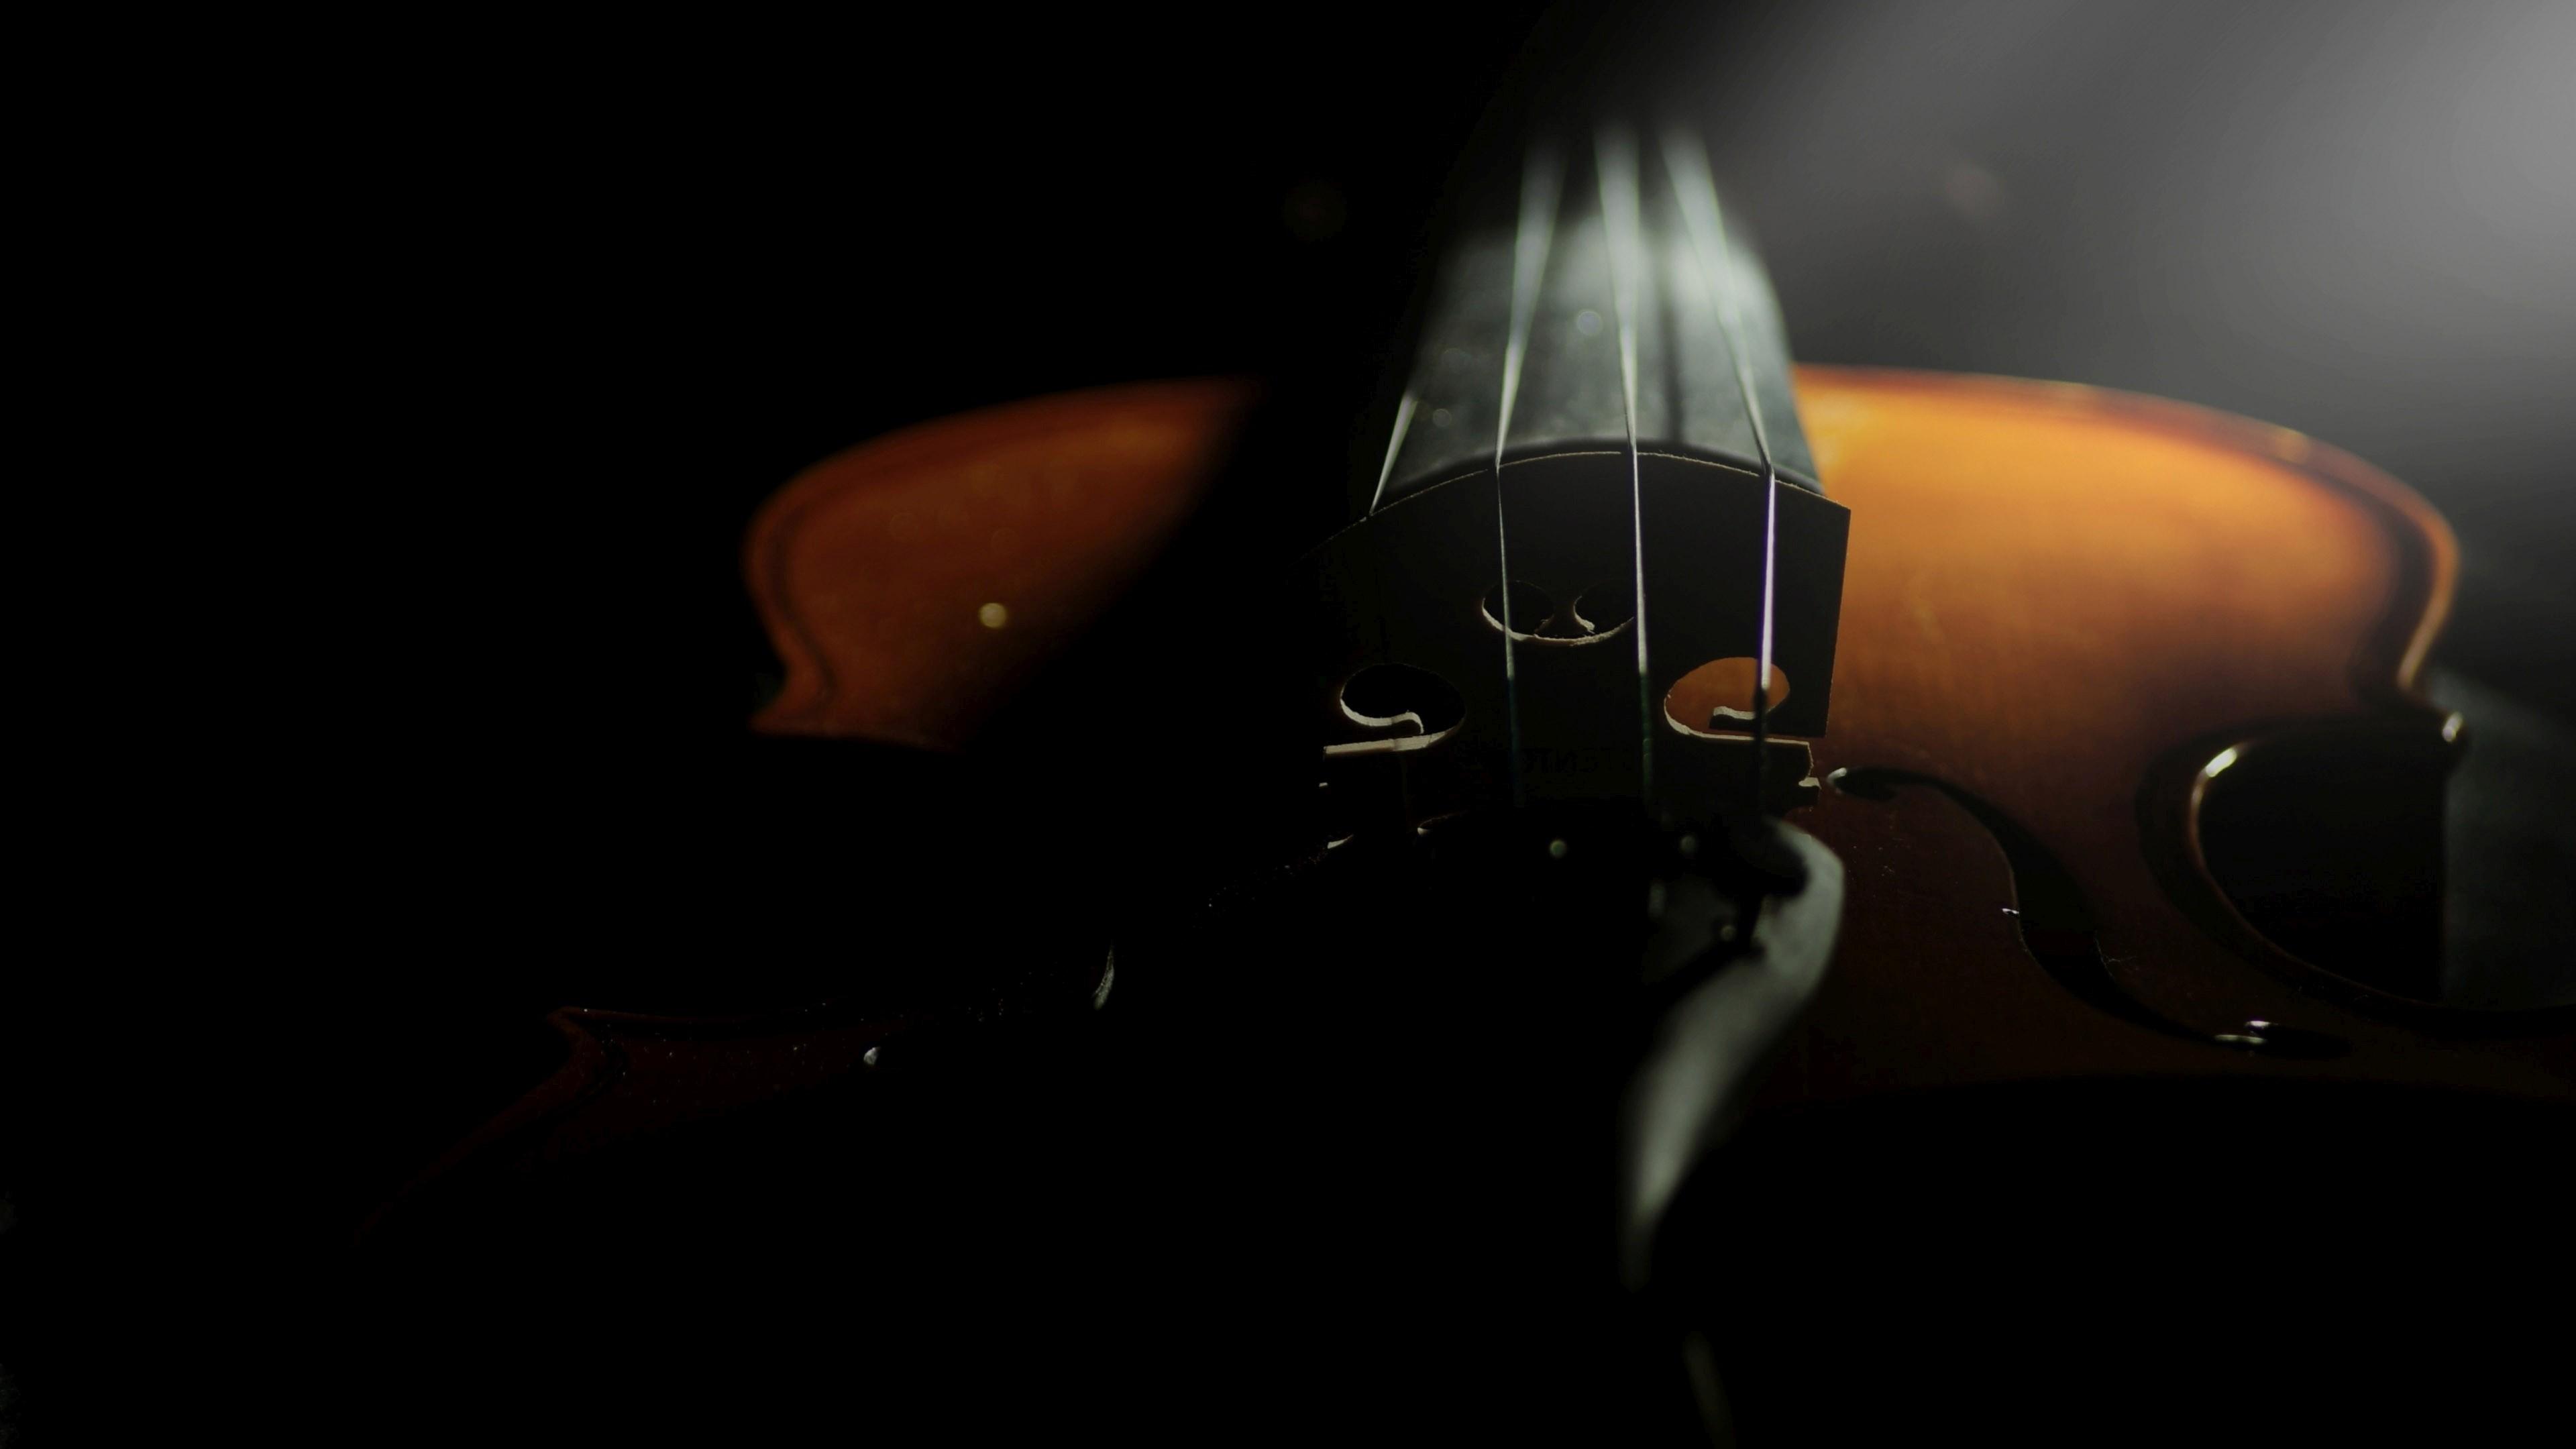 Violin Wallpaper: Violin Wallpaper (69+ Images